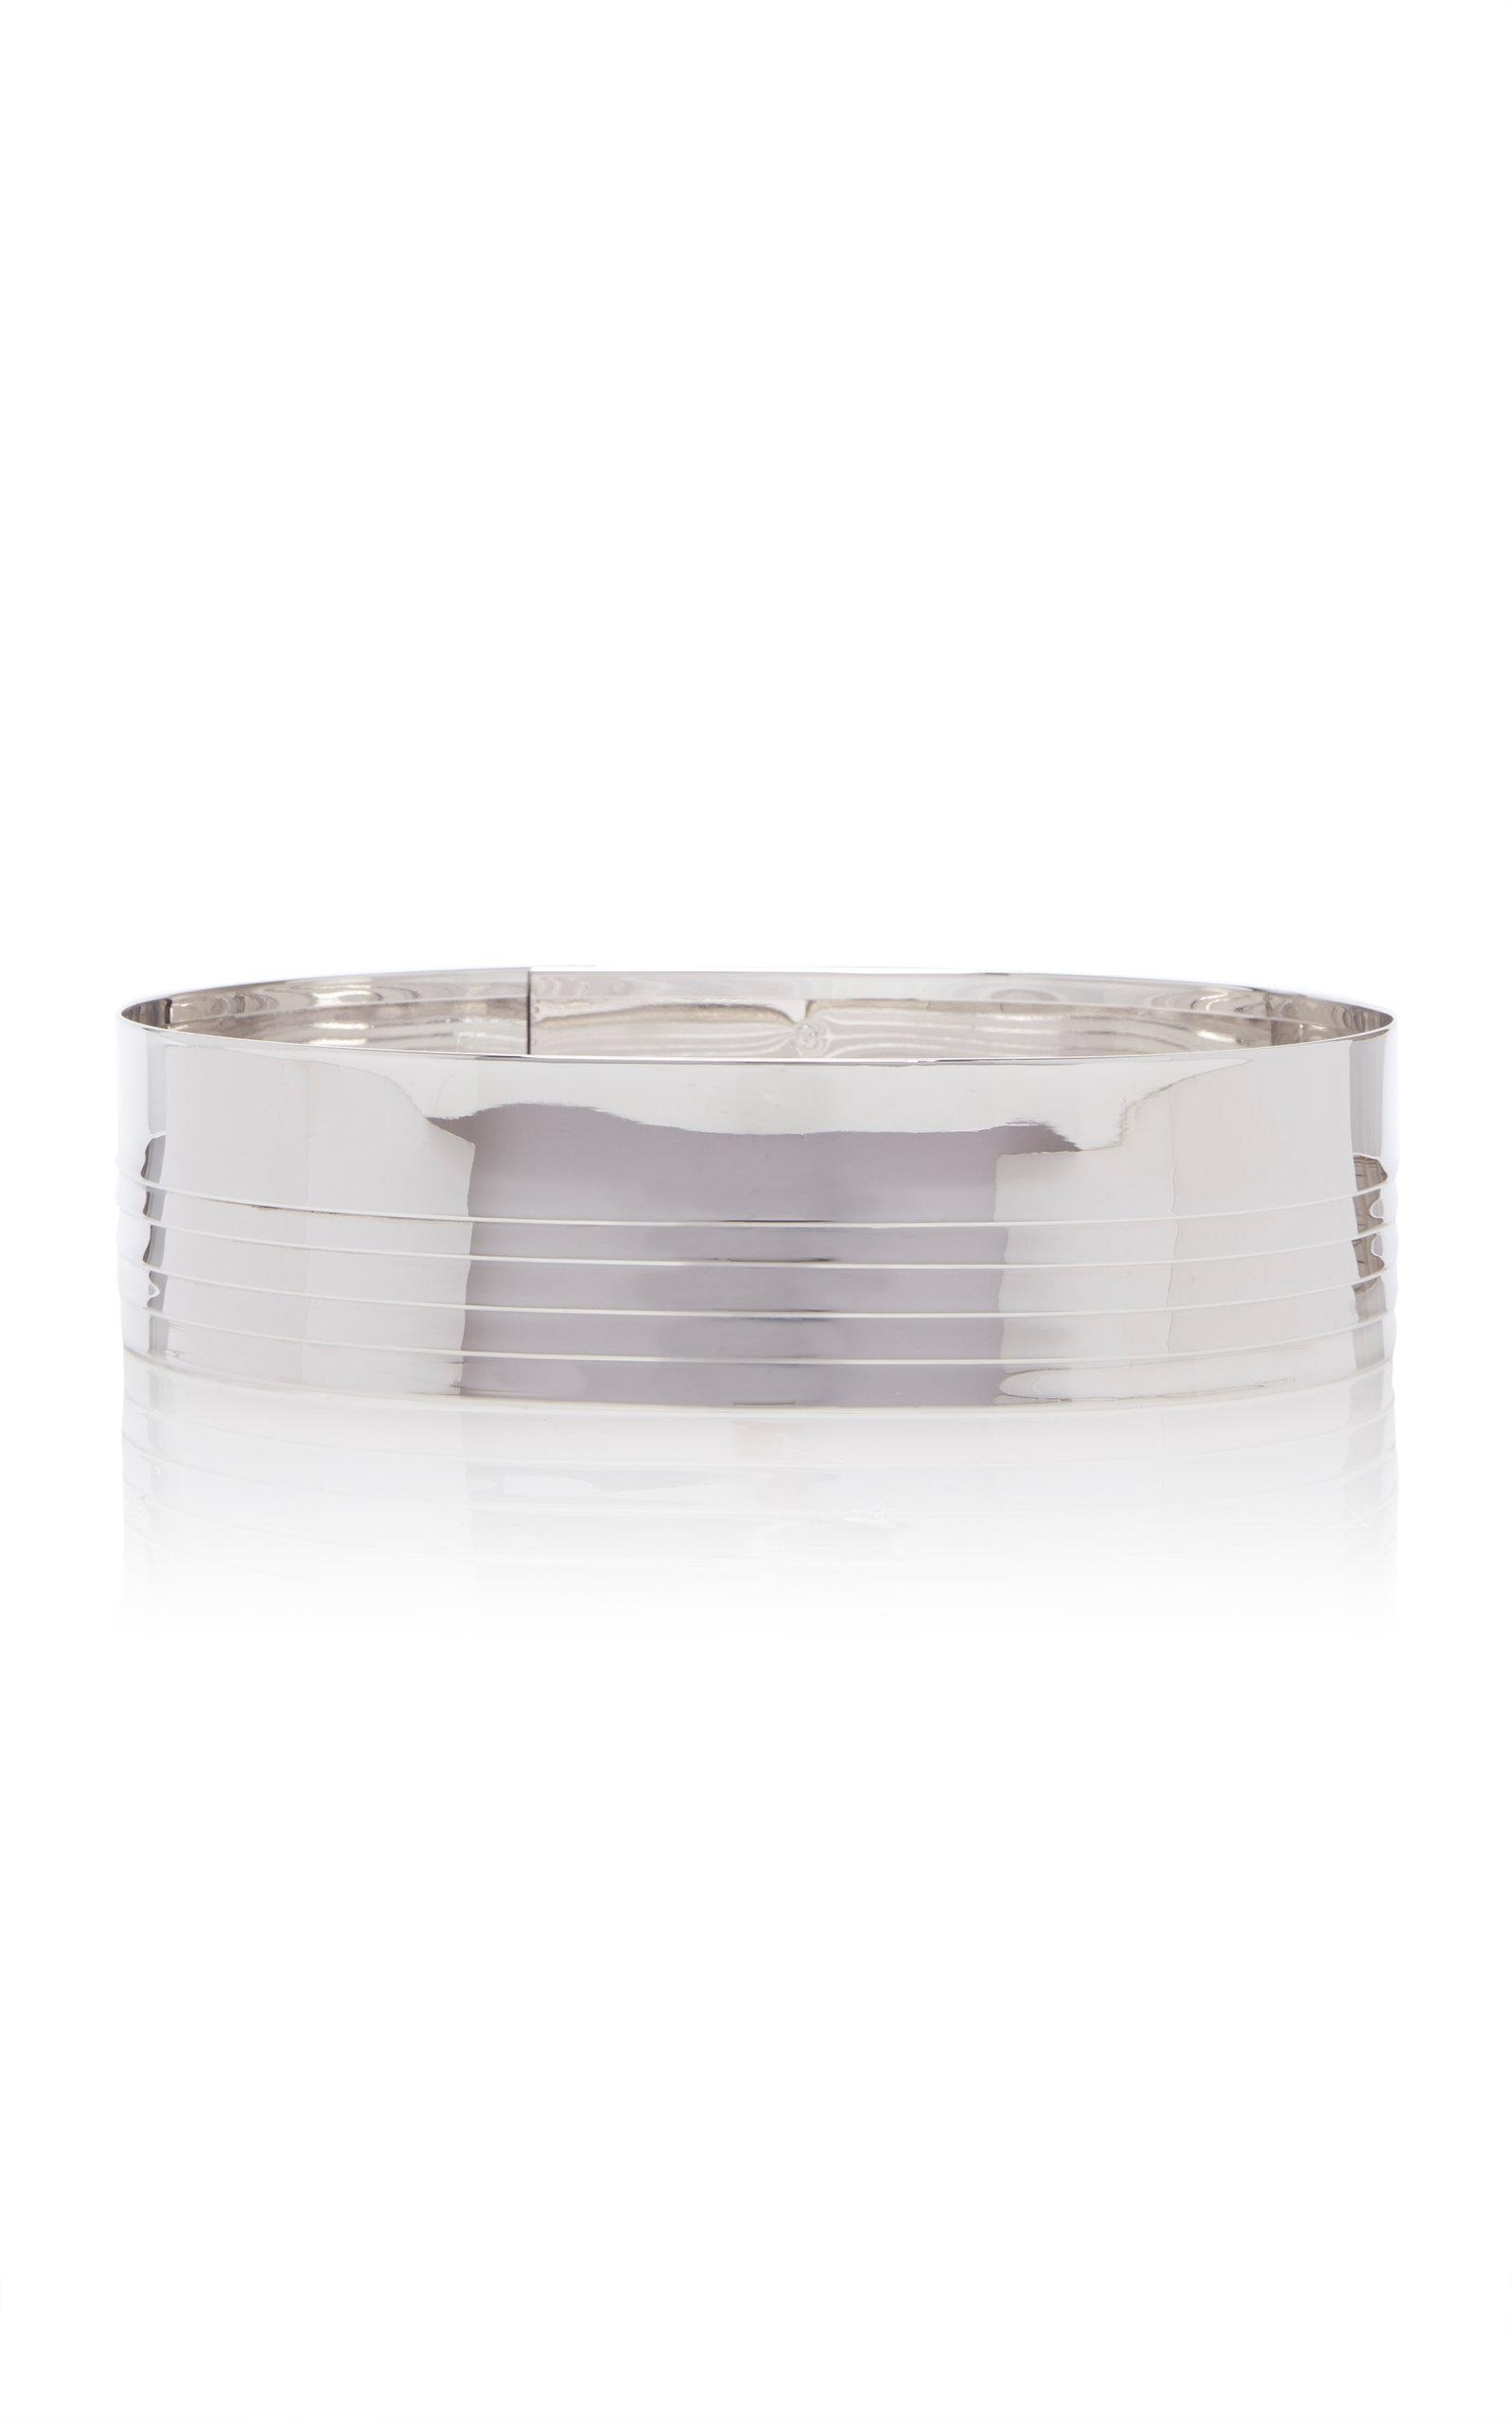 Balmain Brass Belt In Metallic - Lyst within Gunmetal Perforated Brass Sideboards (Image 6 of 30)